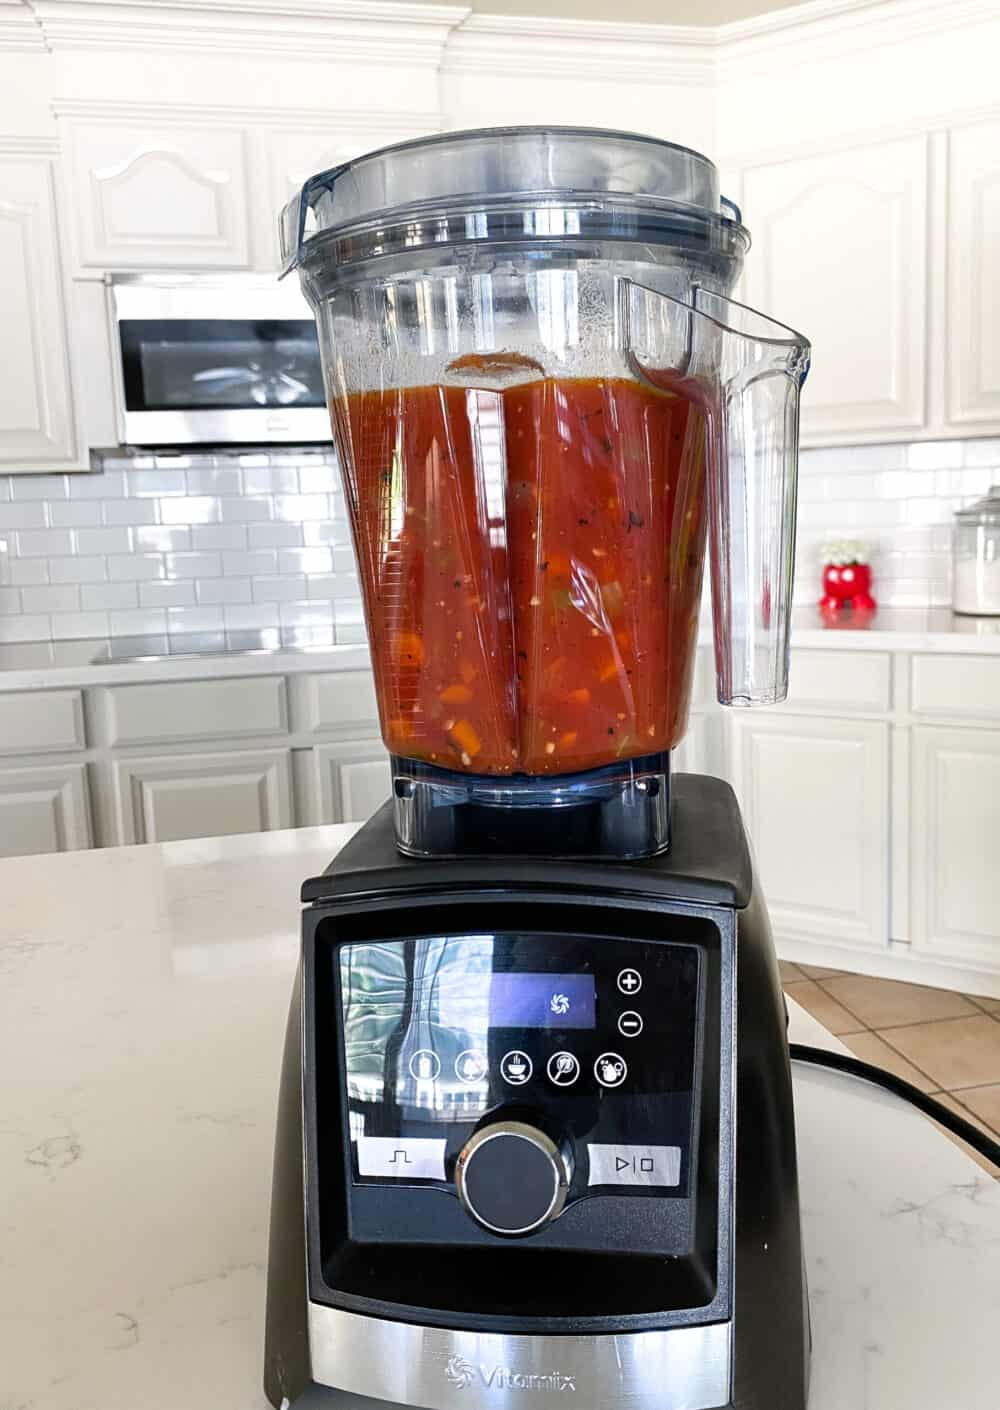 blend tomato bisque until smooth